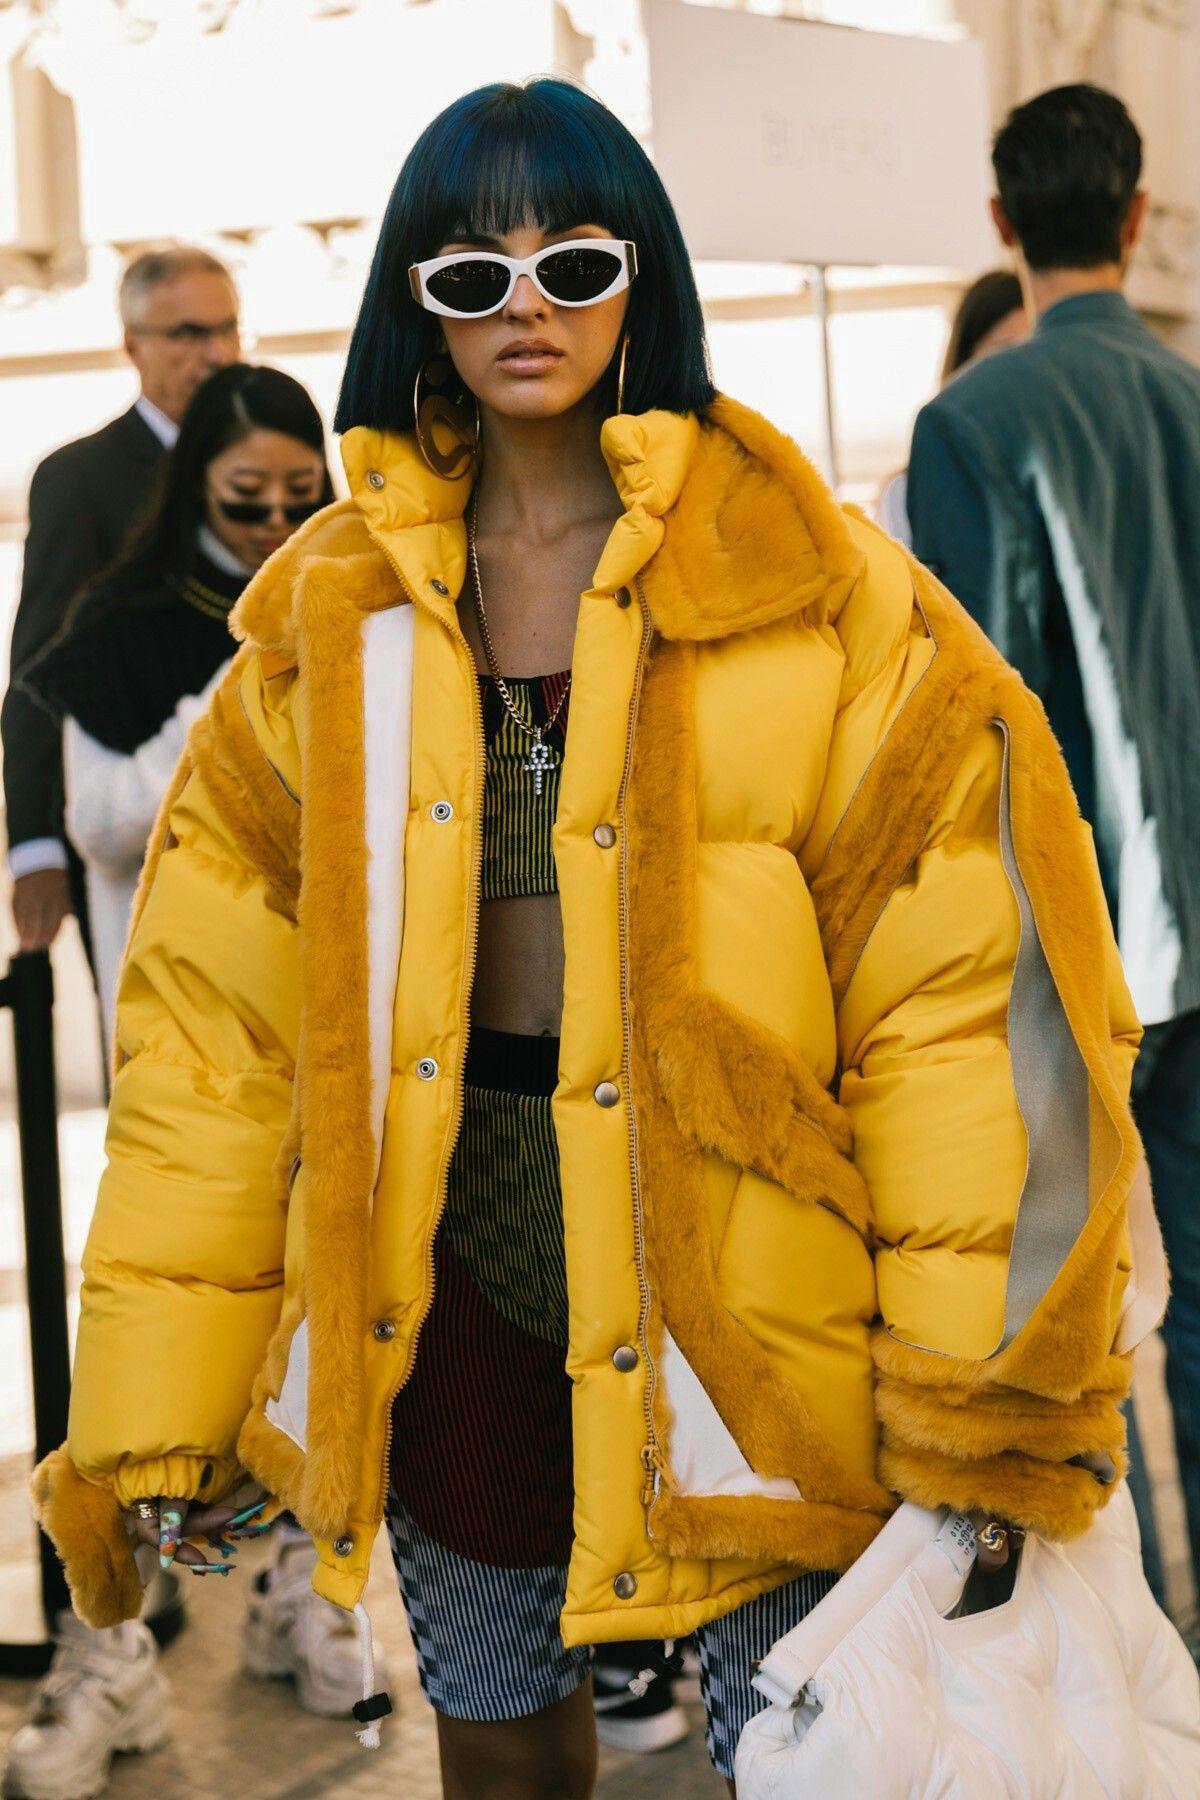 Yellow Oversized Puffer Coat Fashion Puffer Jacket Outfit Emerging Designers Fashion [ 1800 x 1200 Pixel ]